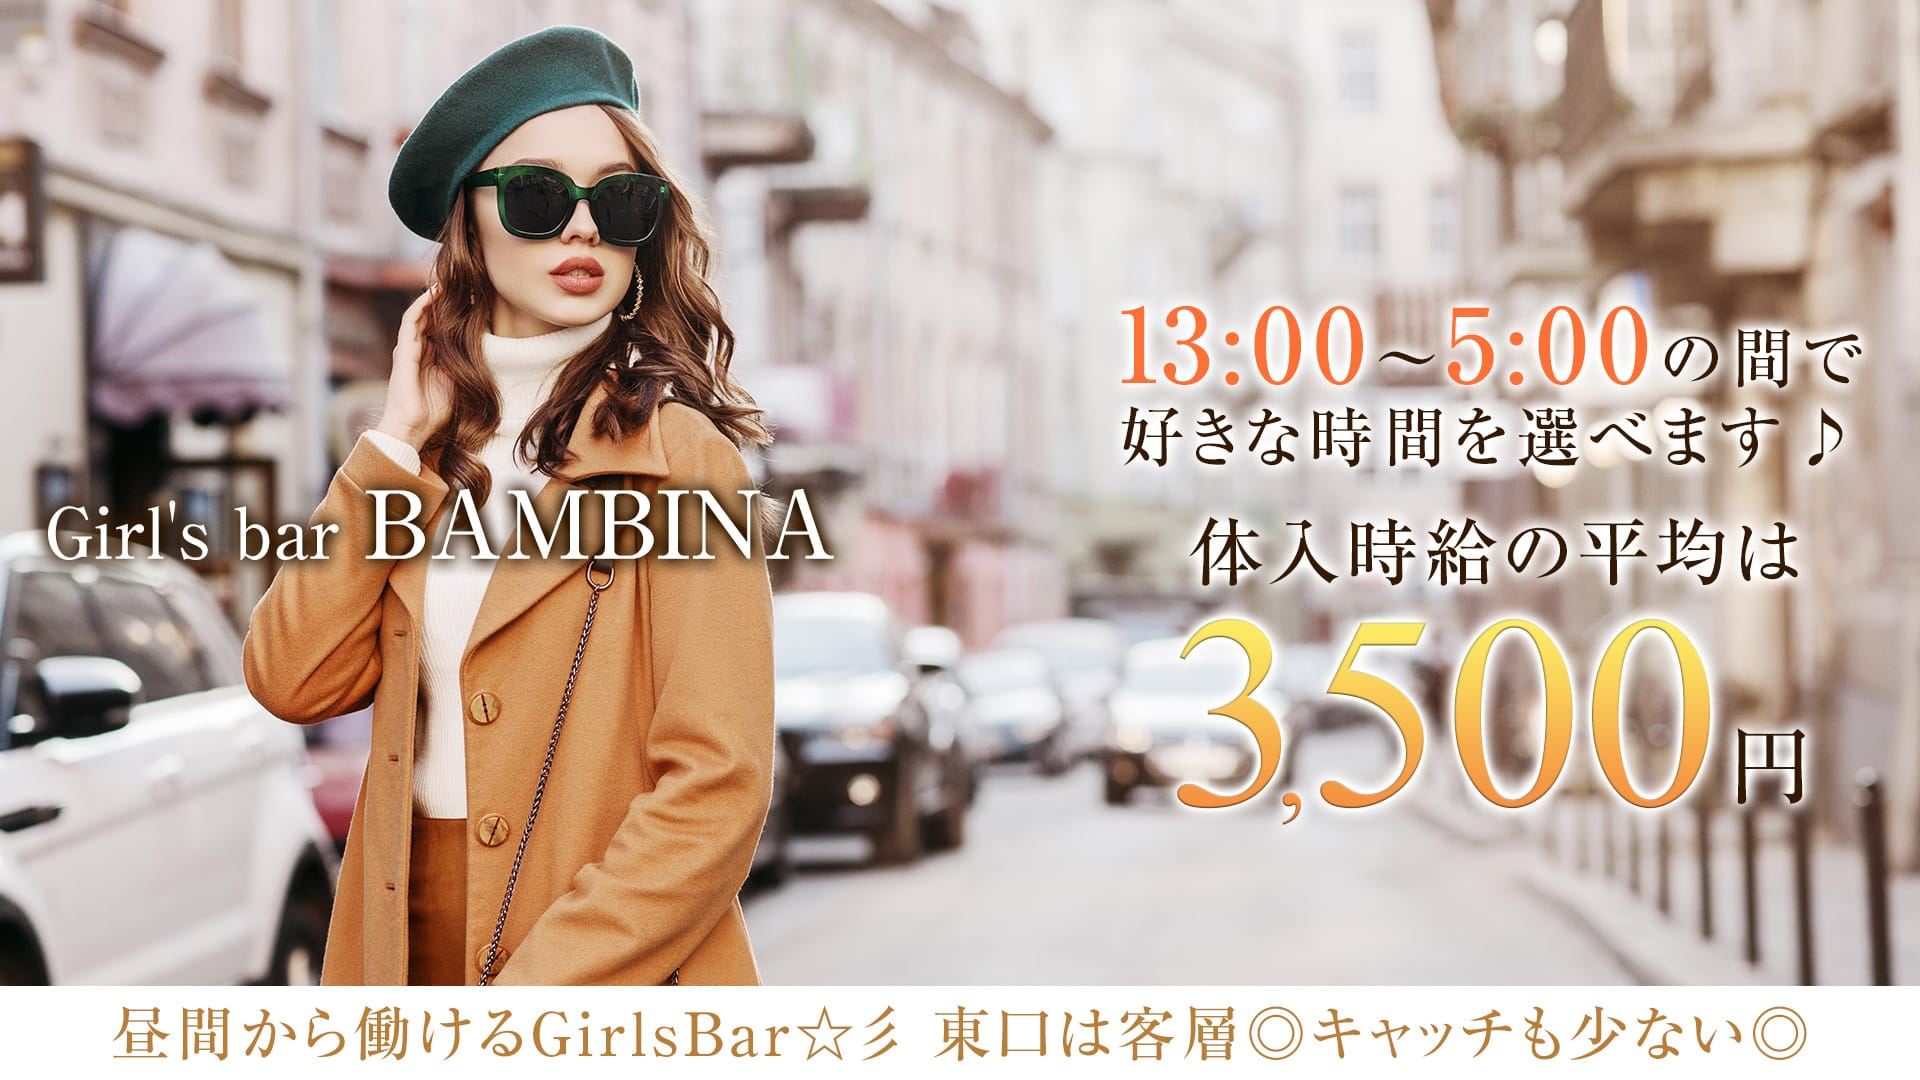 girl's bar BAMBINA(バンビーナ) 池袋ガールズバー TOP画像